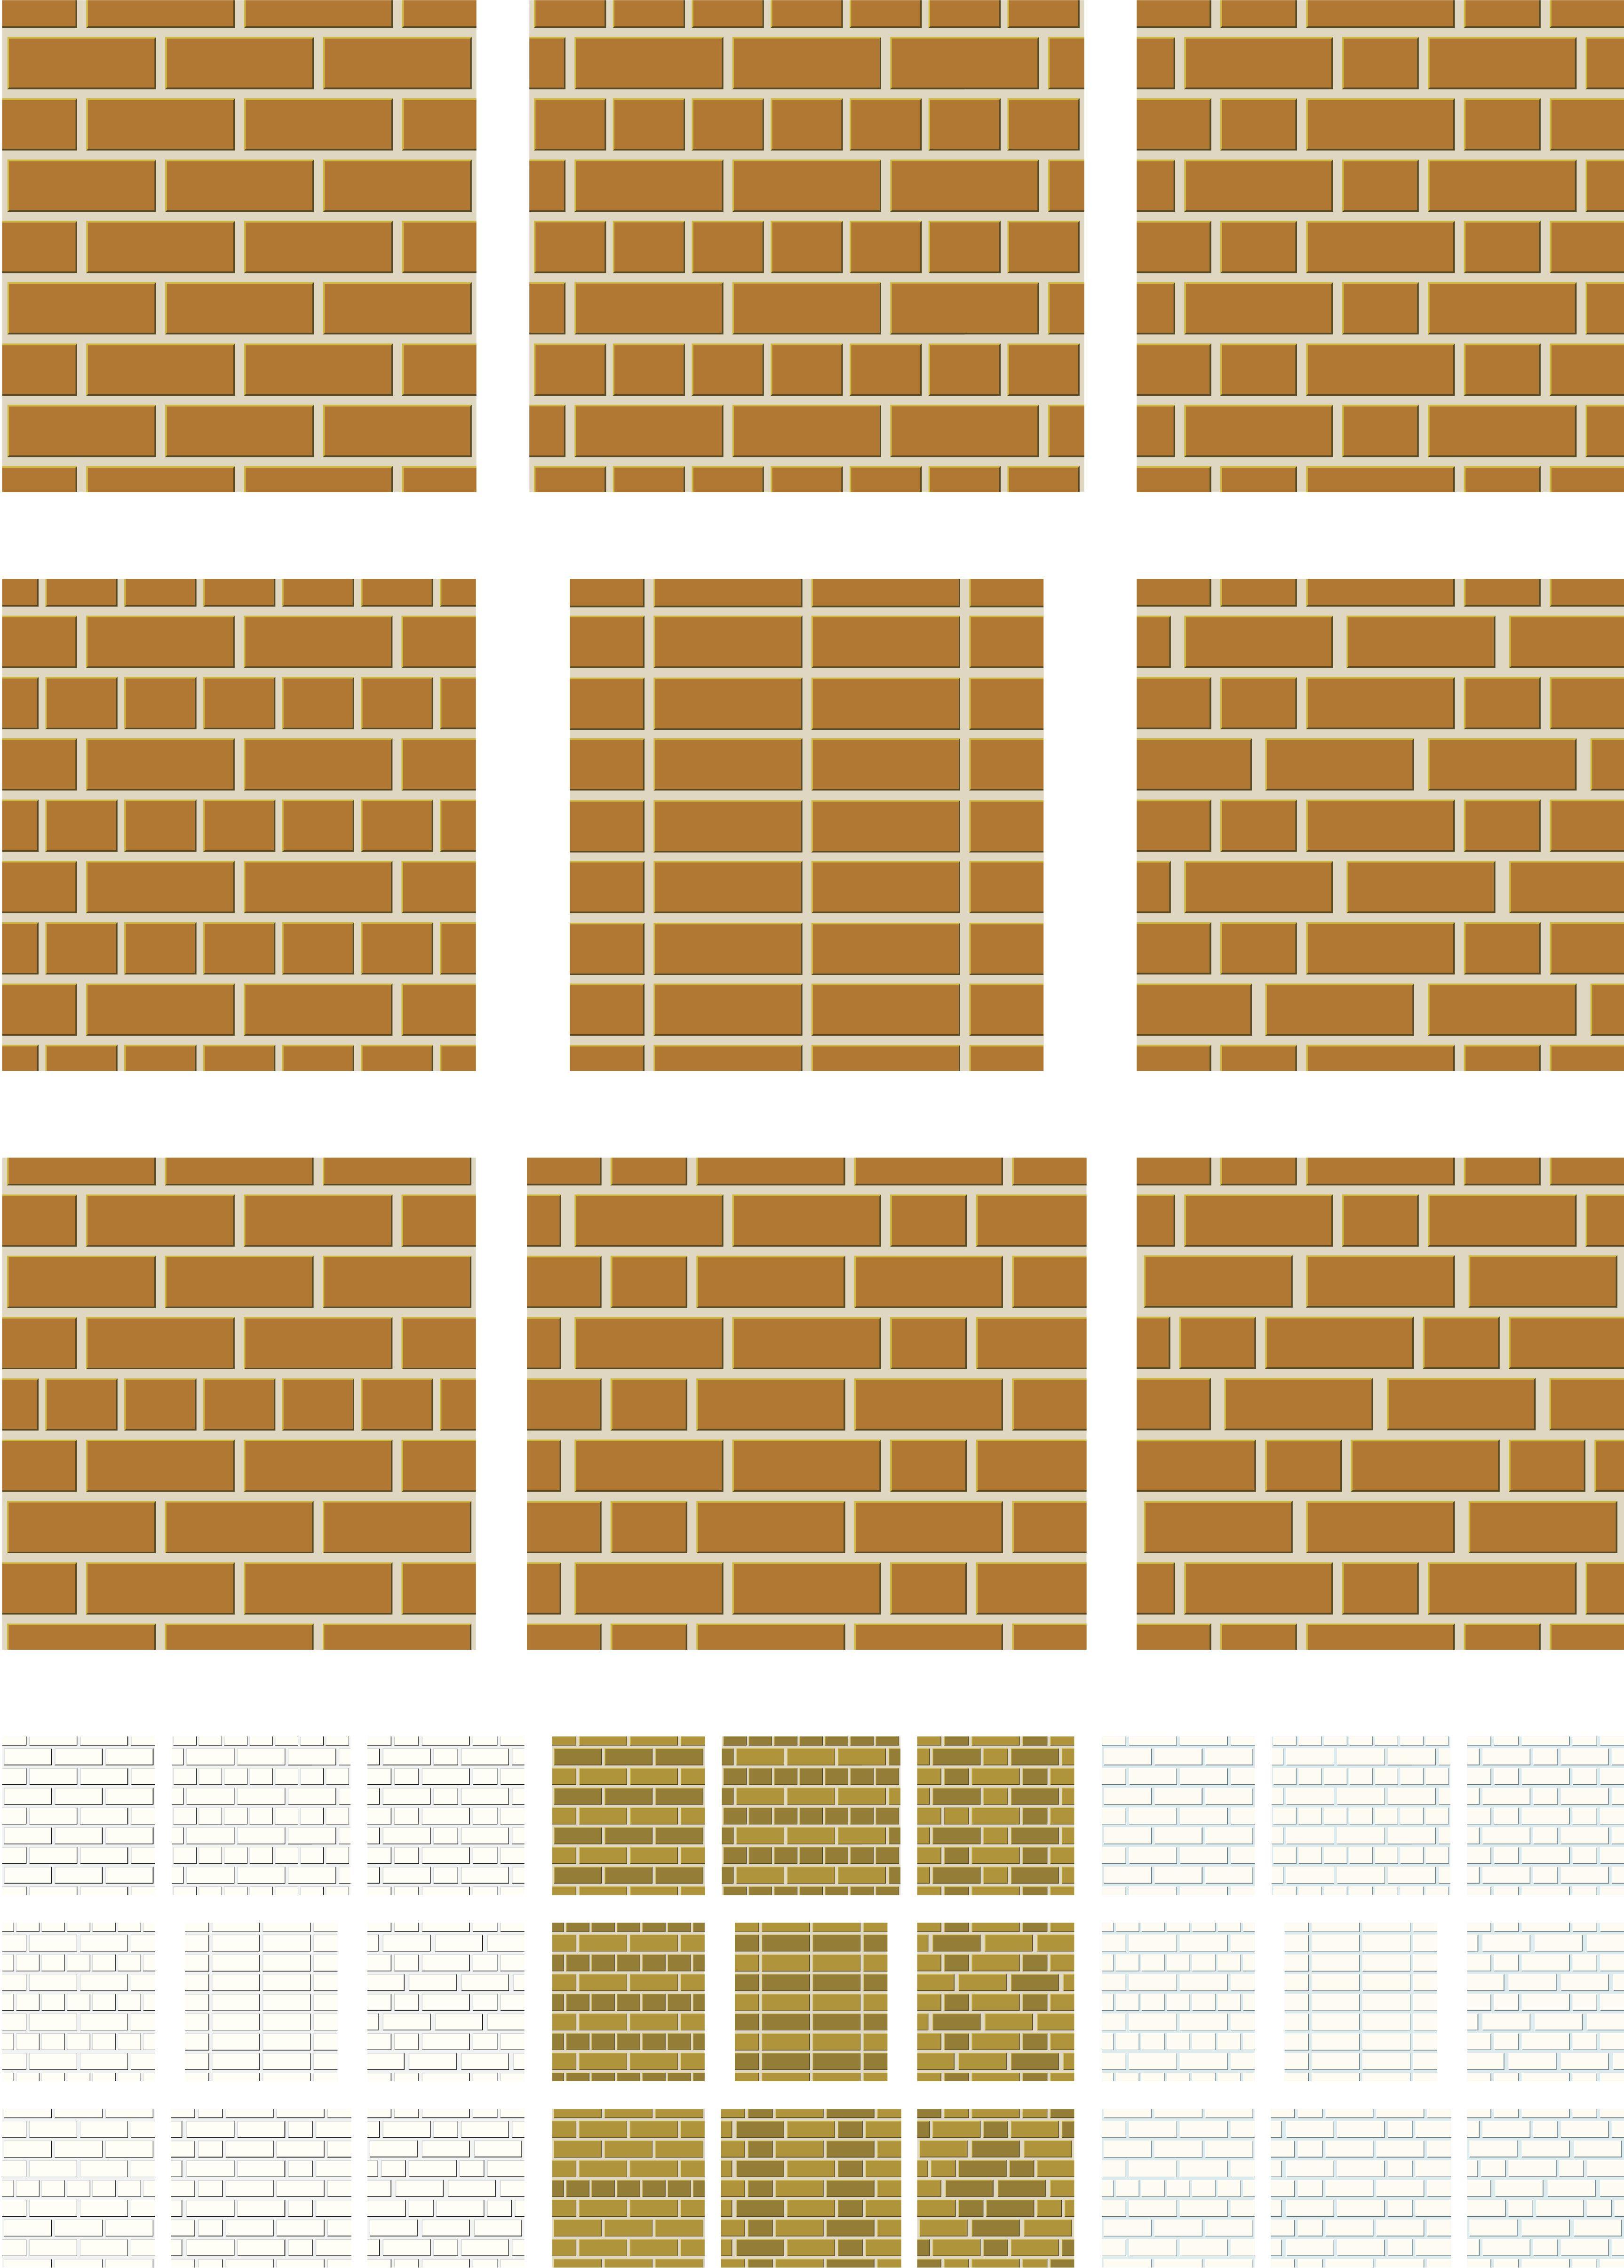 Brick Wall Patterns Unique Design Ideas